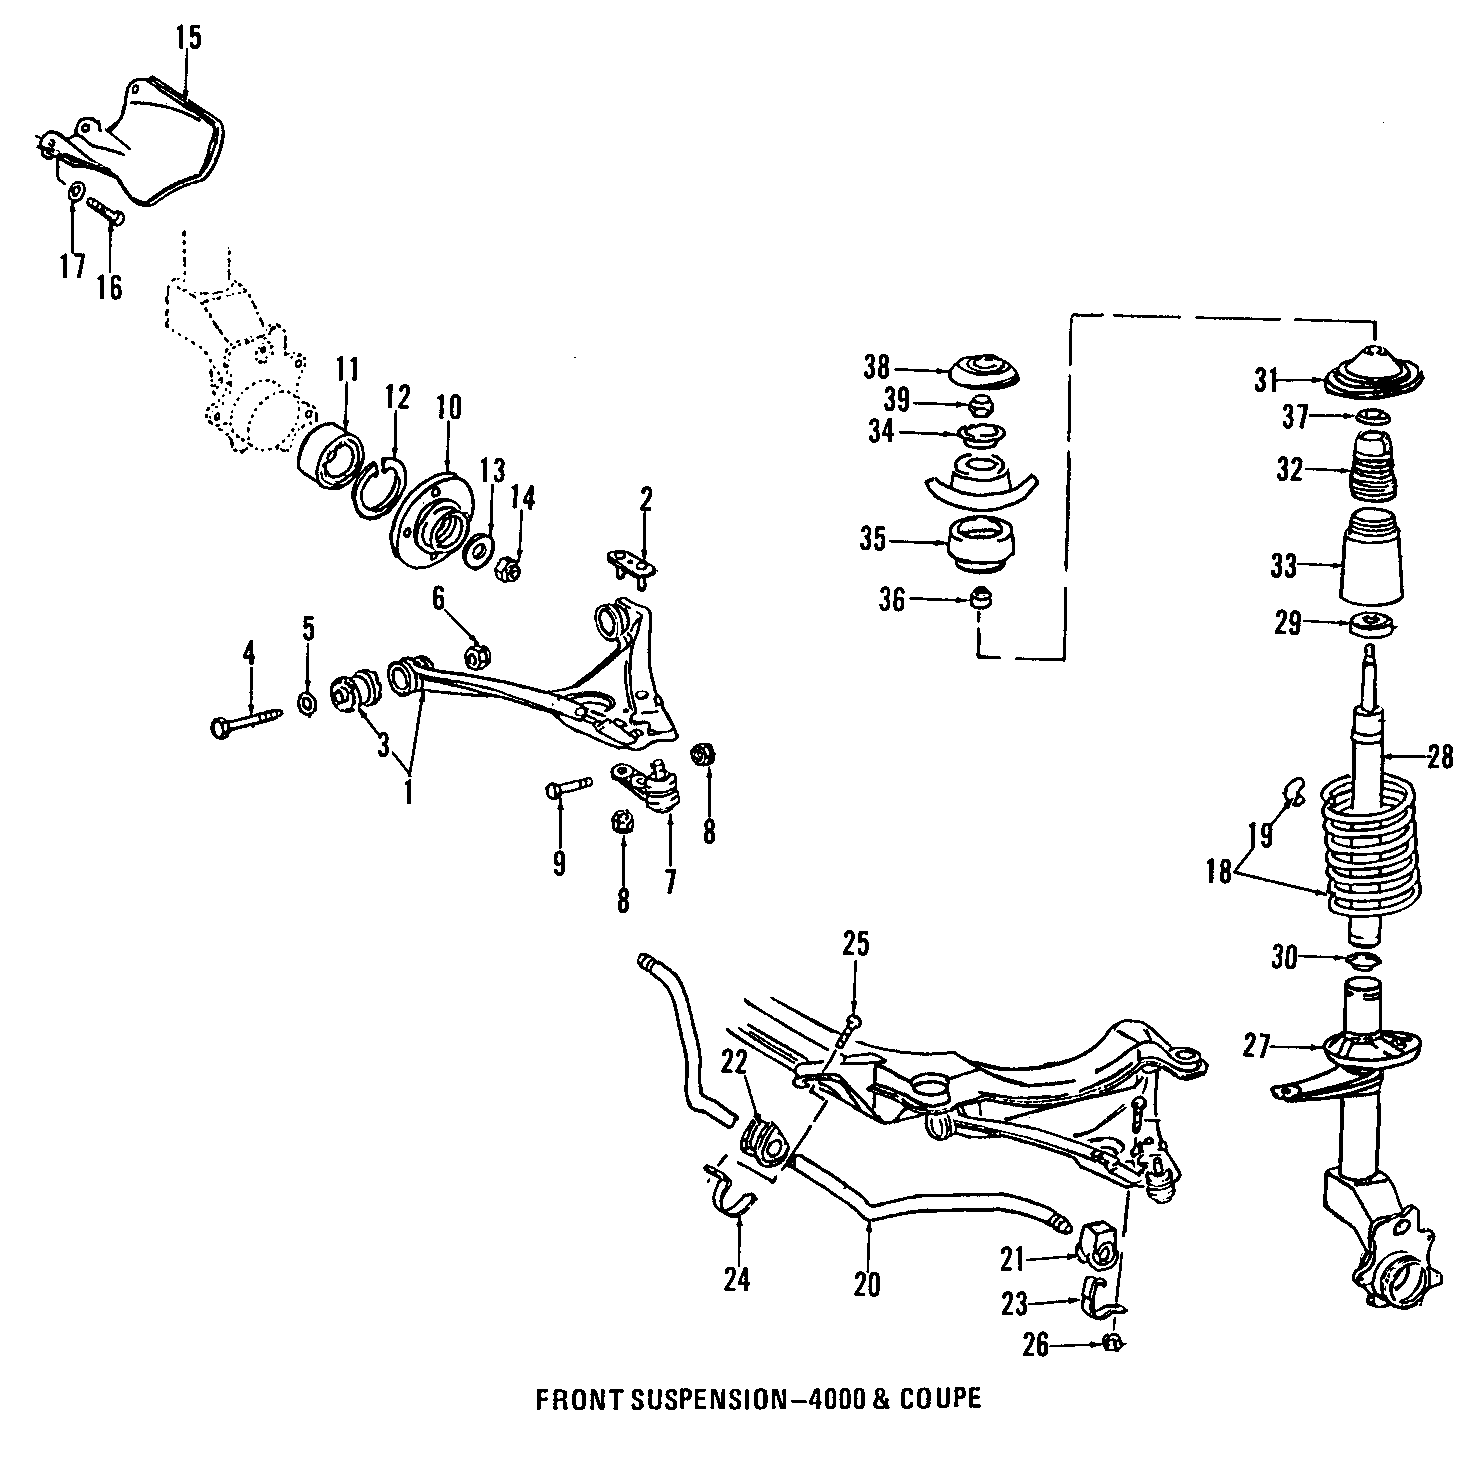 1991 Audi Arm. CONTROL. Bushing. Mount. SUSPENSION